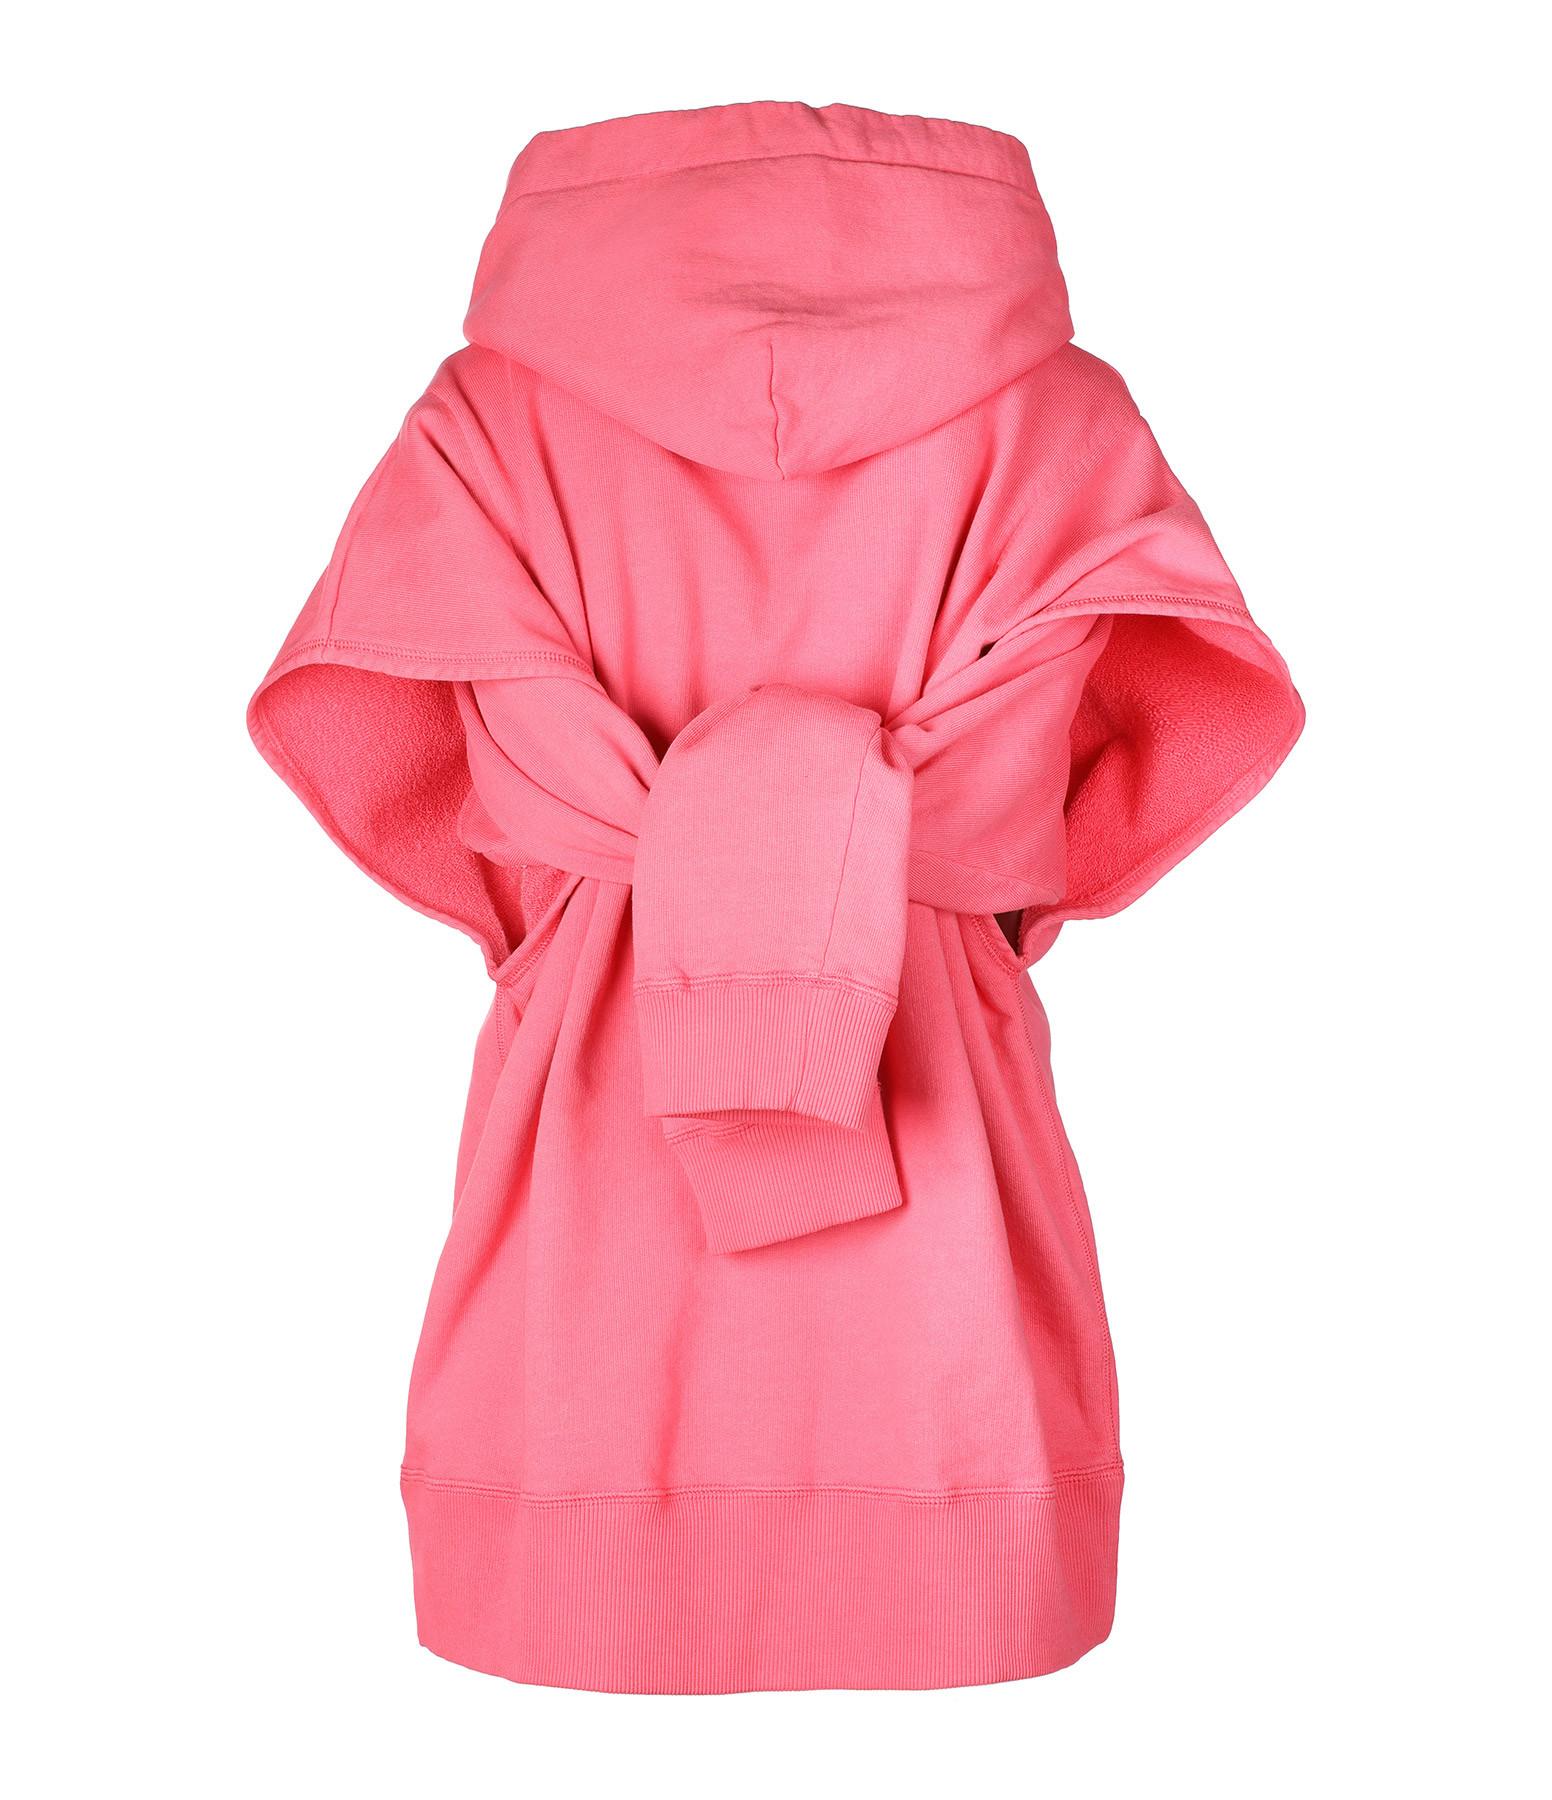 MM6 MAISON MARGIELA - Sweatshirt Coton Rose Barbie